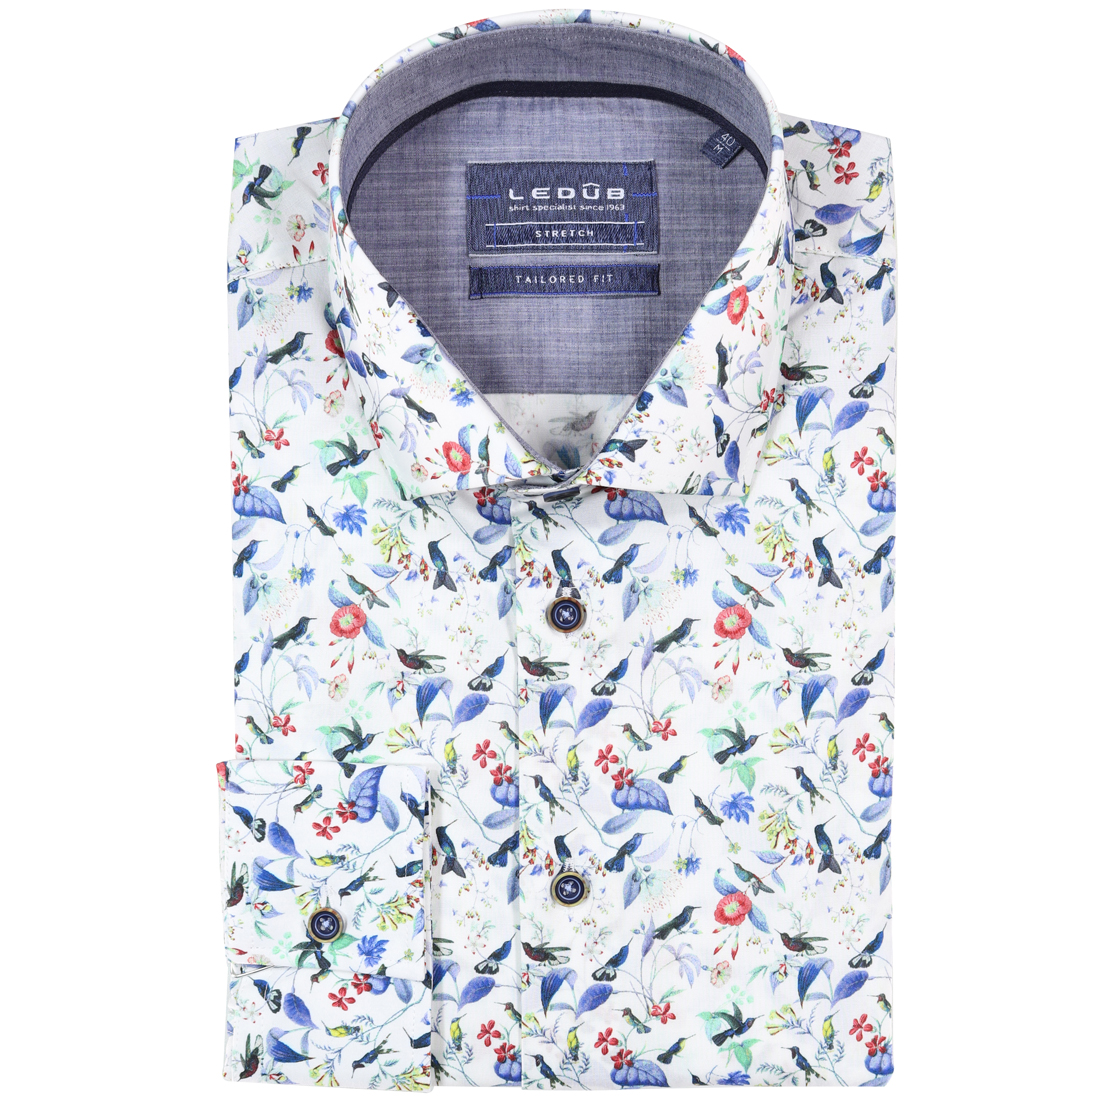 Ledub overhemd Tailored Fit 0137813 in het Wit/Blauw